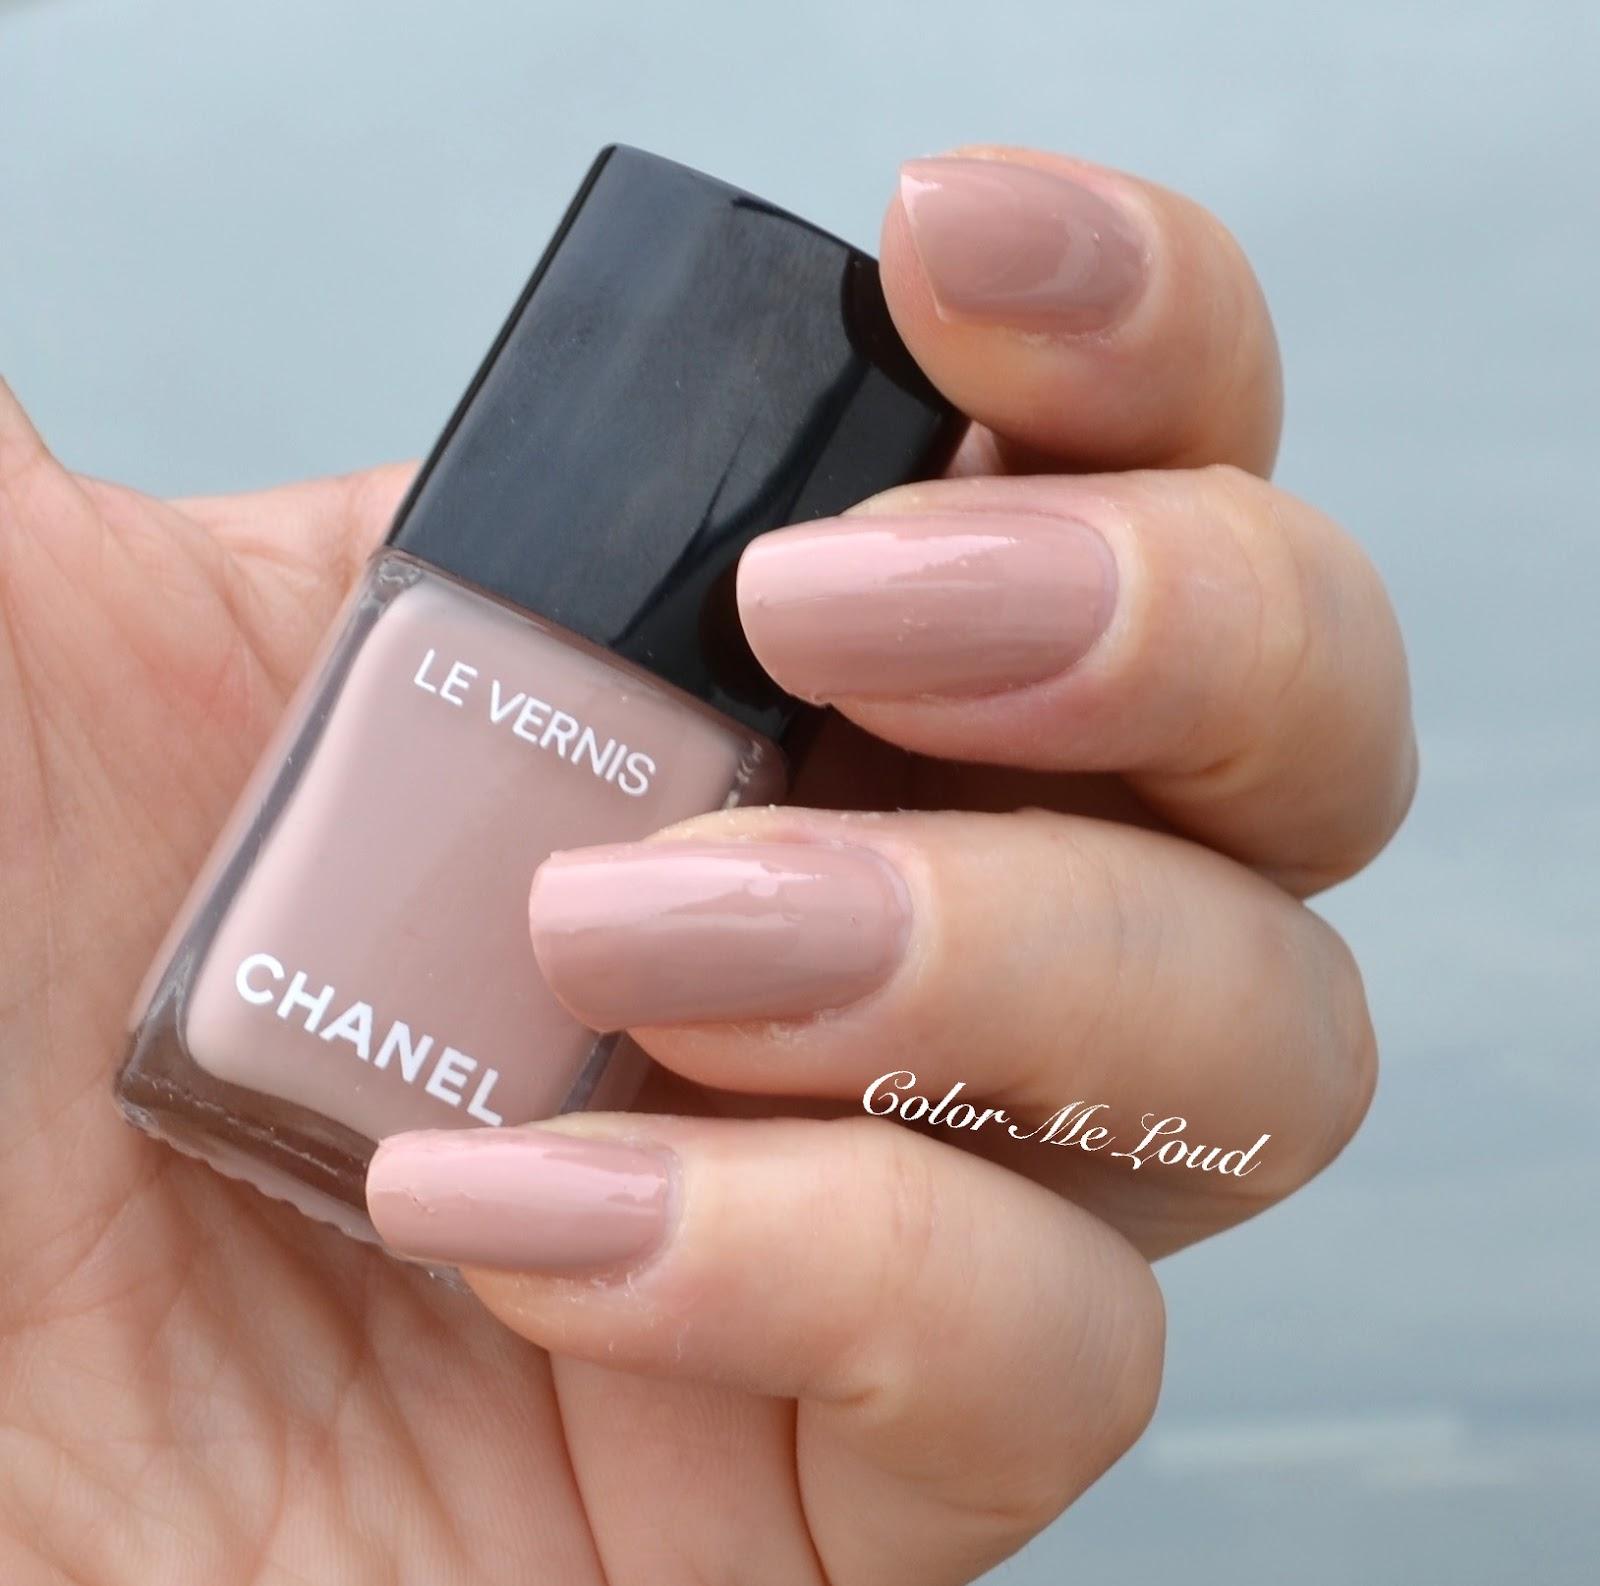 Chanel Le Vernis Longwear Nail Colour, Nudes & Vamps, Review, Swatch ...